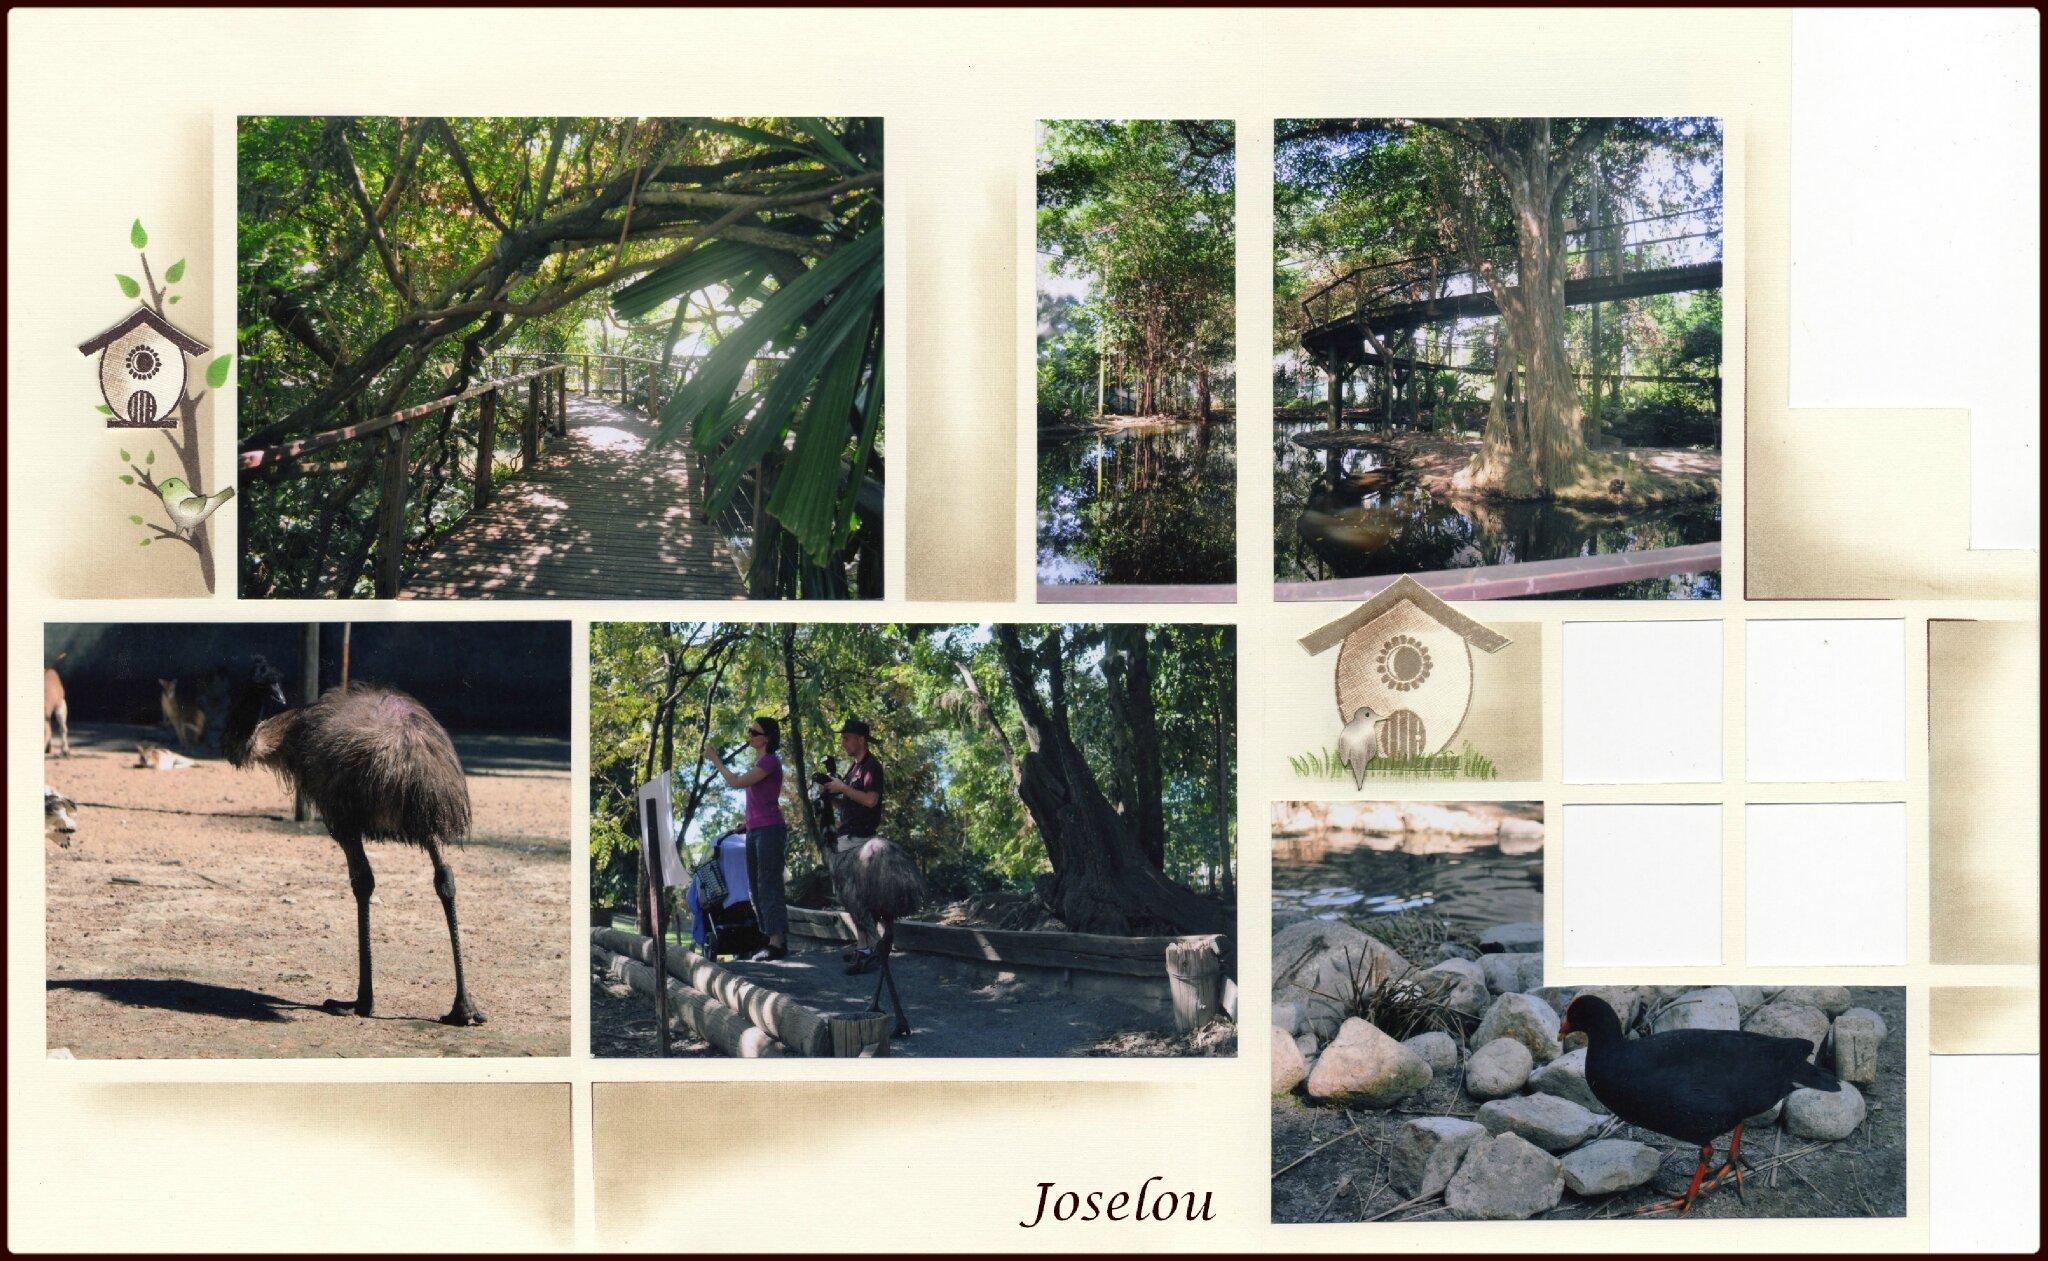 Wildlife habitat 7